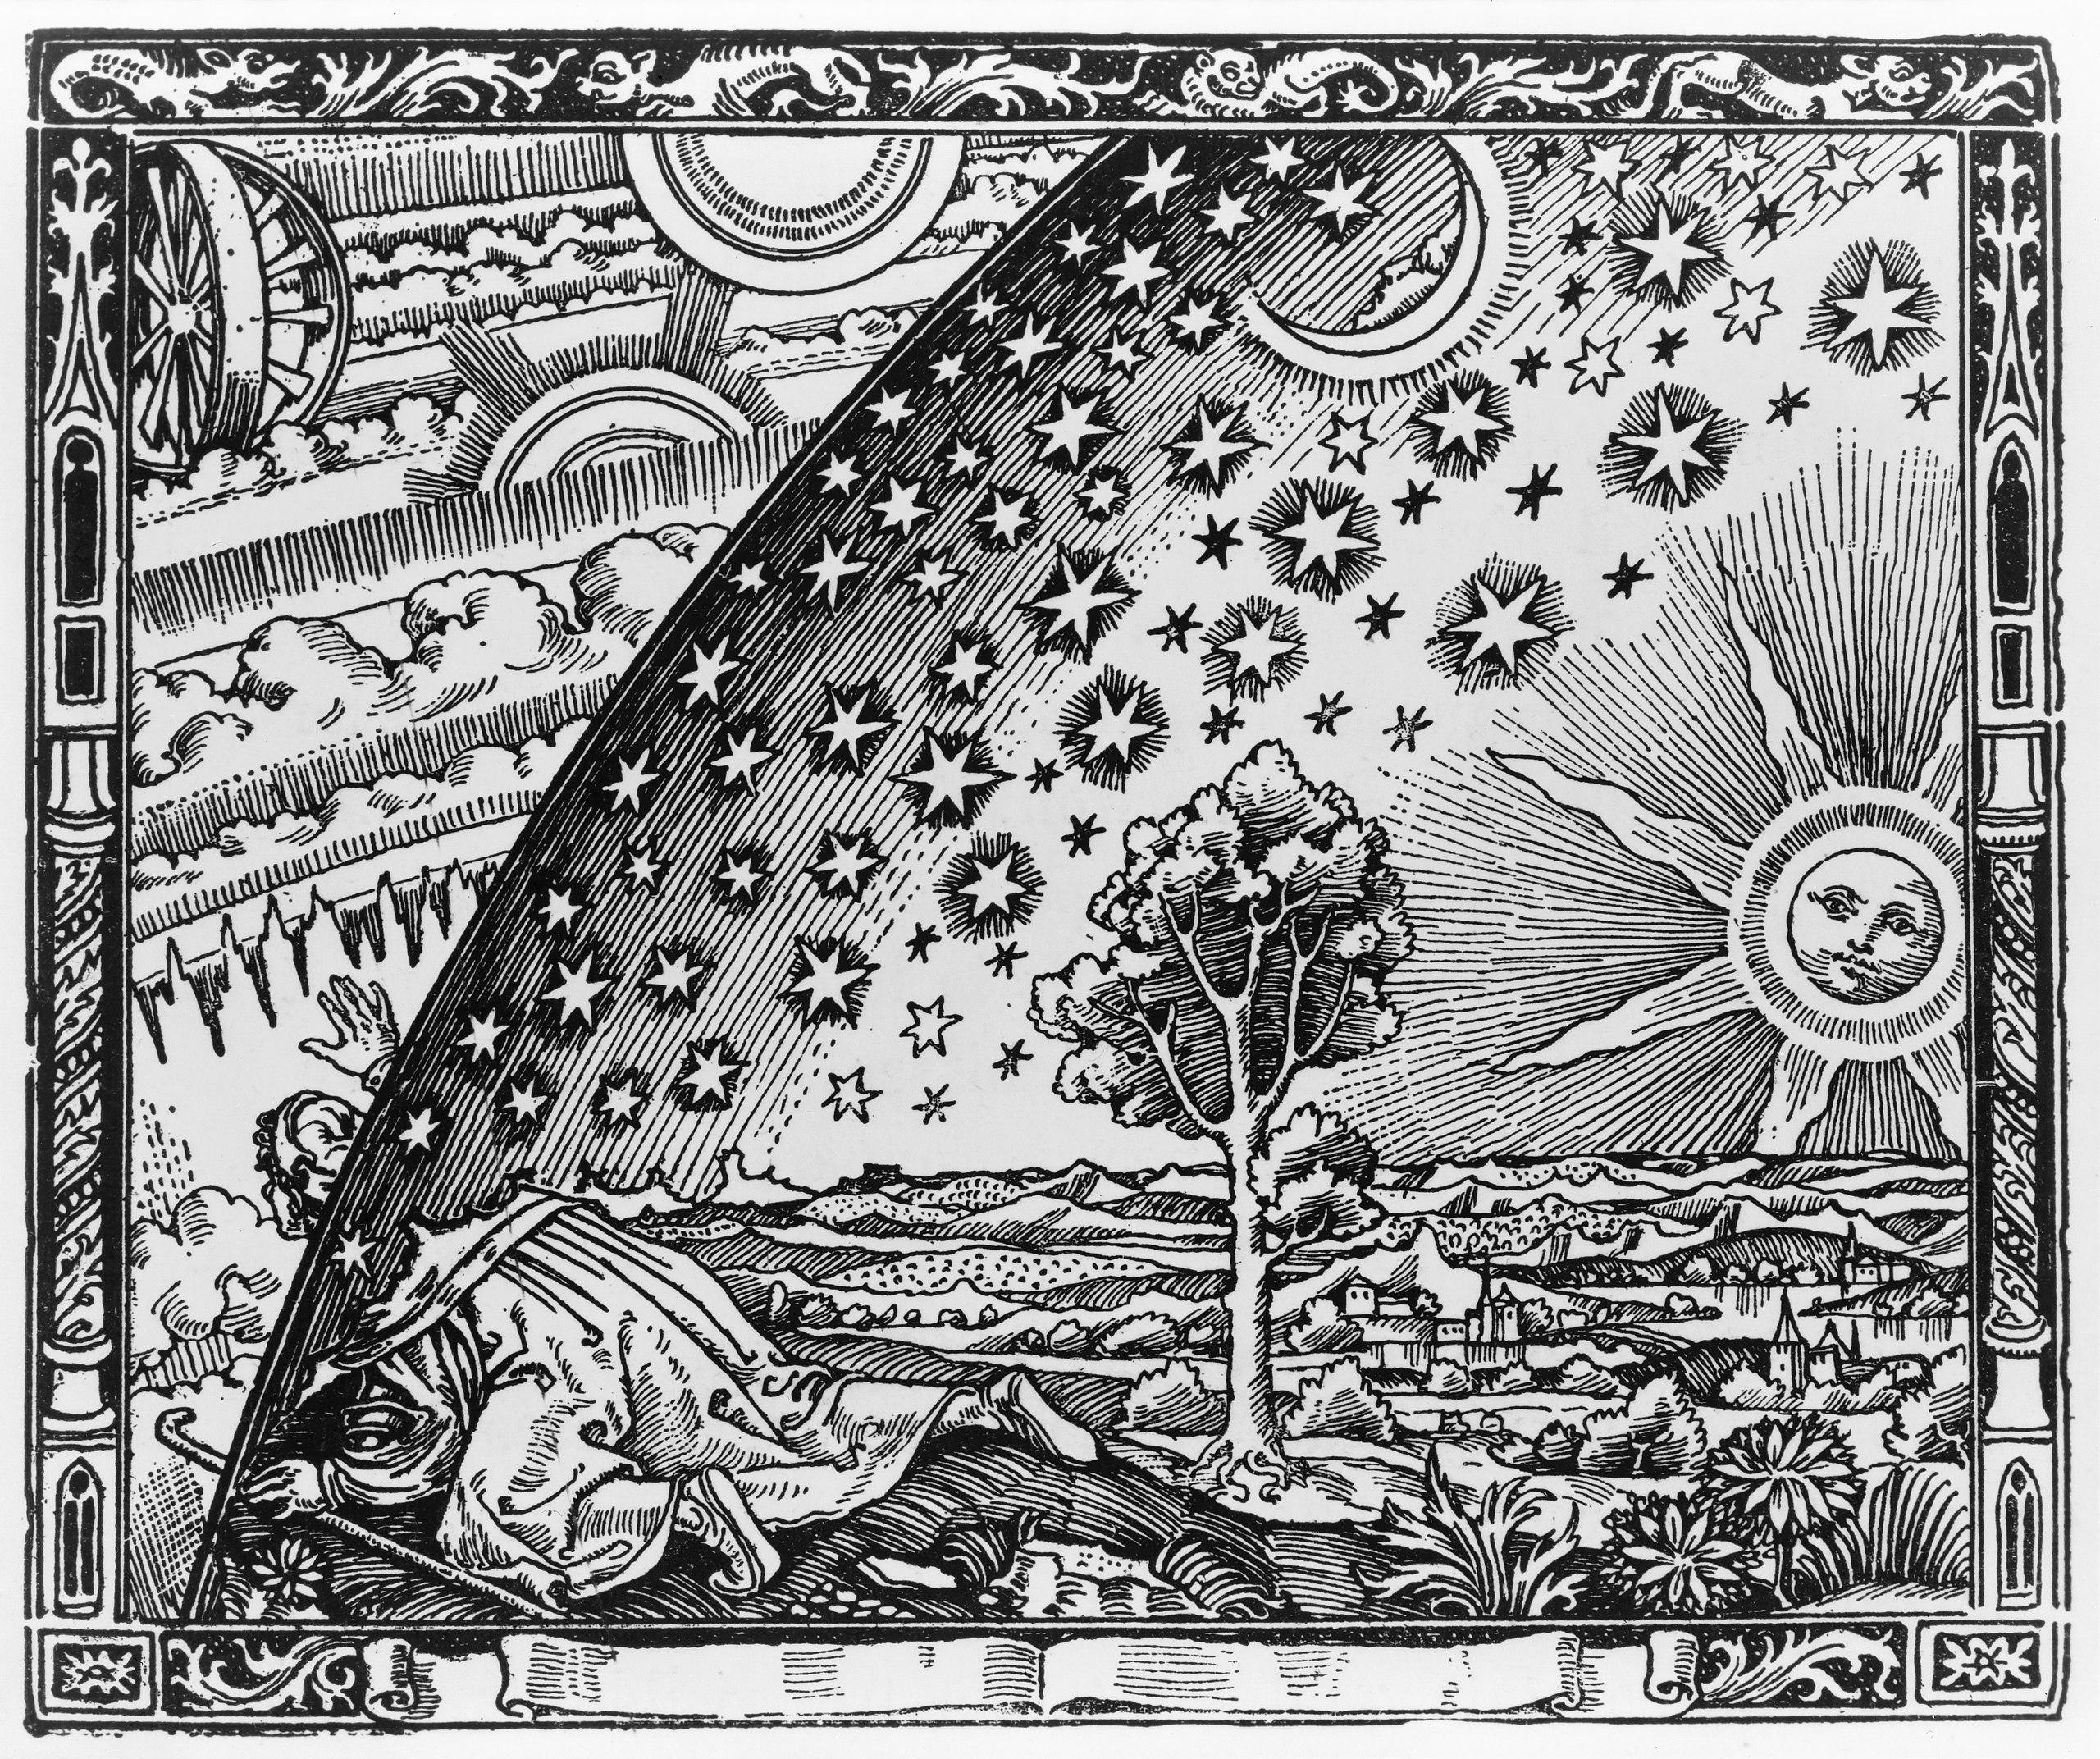 Flammarions Holzstich